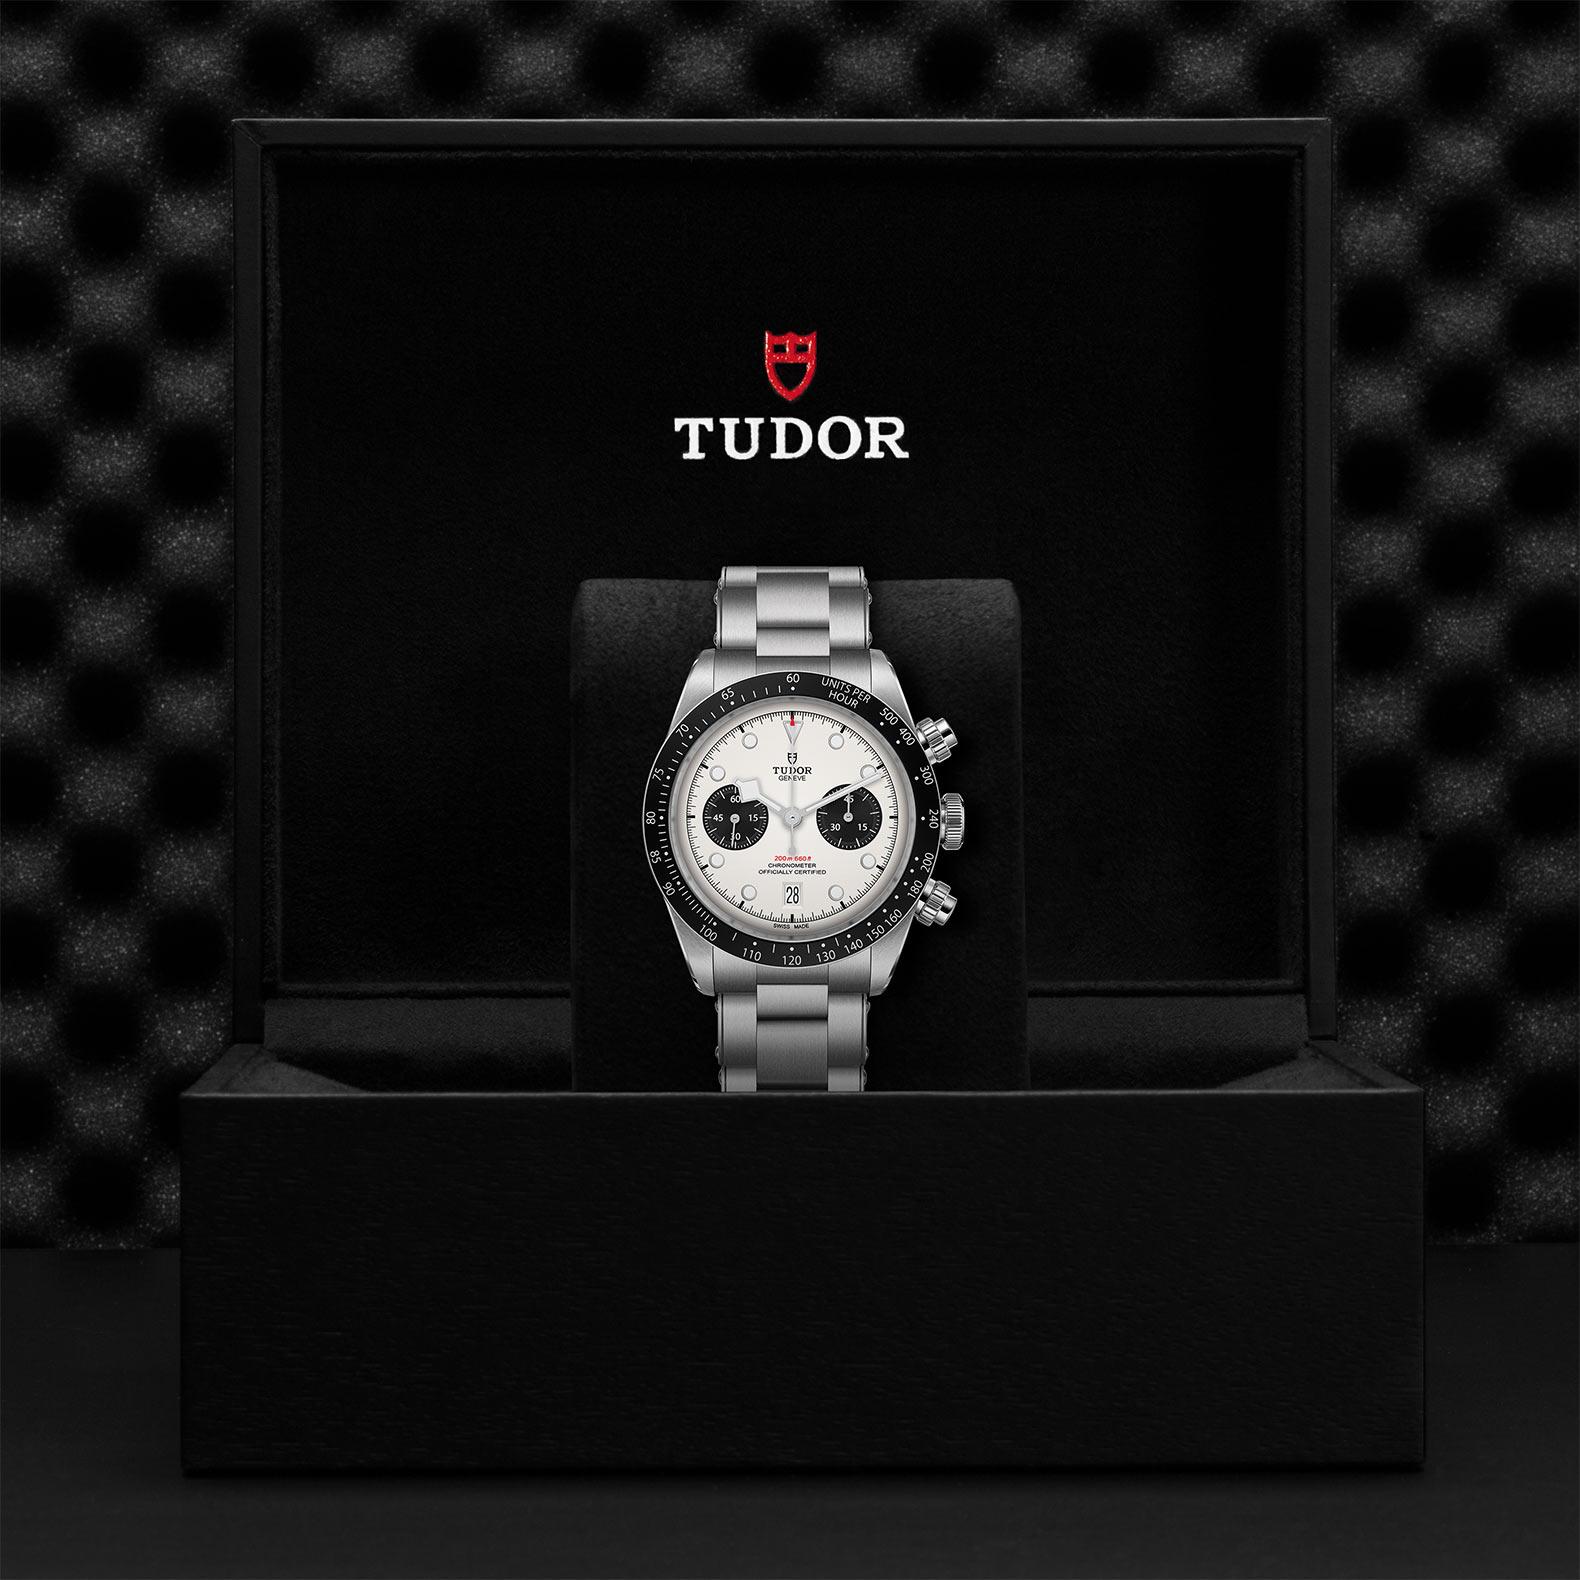 TUDOR Black Bay Chrono - M79360N-0002